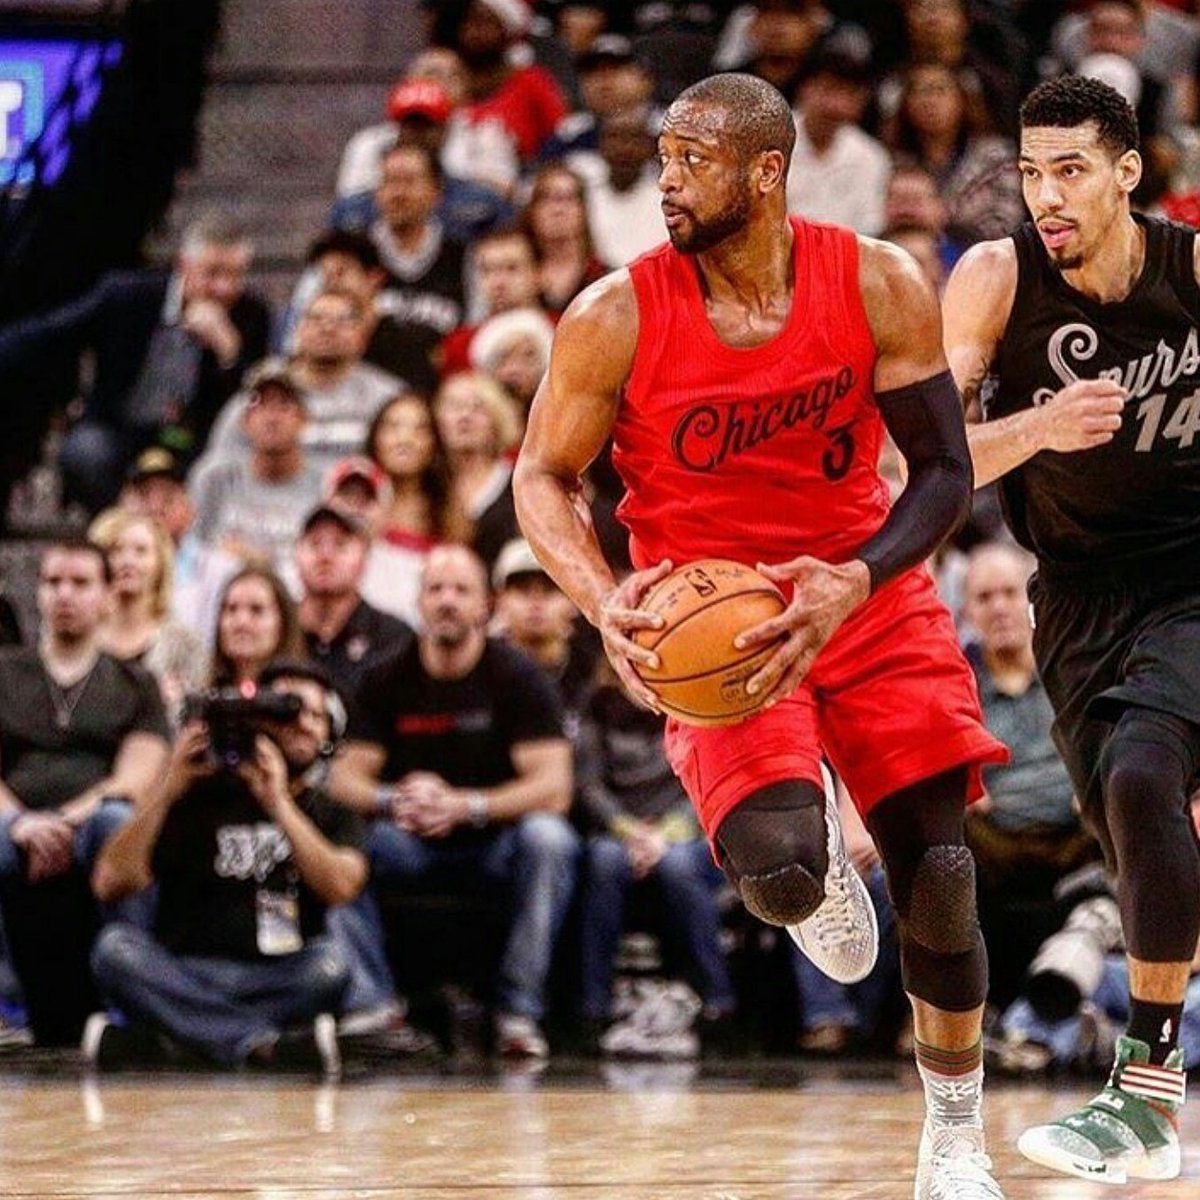 @DwyaneWade #NBAVOTE #NBA #AllStar #Chicago #ChicagoBulls #Basketball Please #retweet https://t.co/9EPcigcWXb